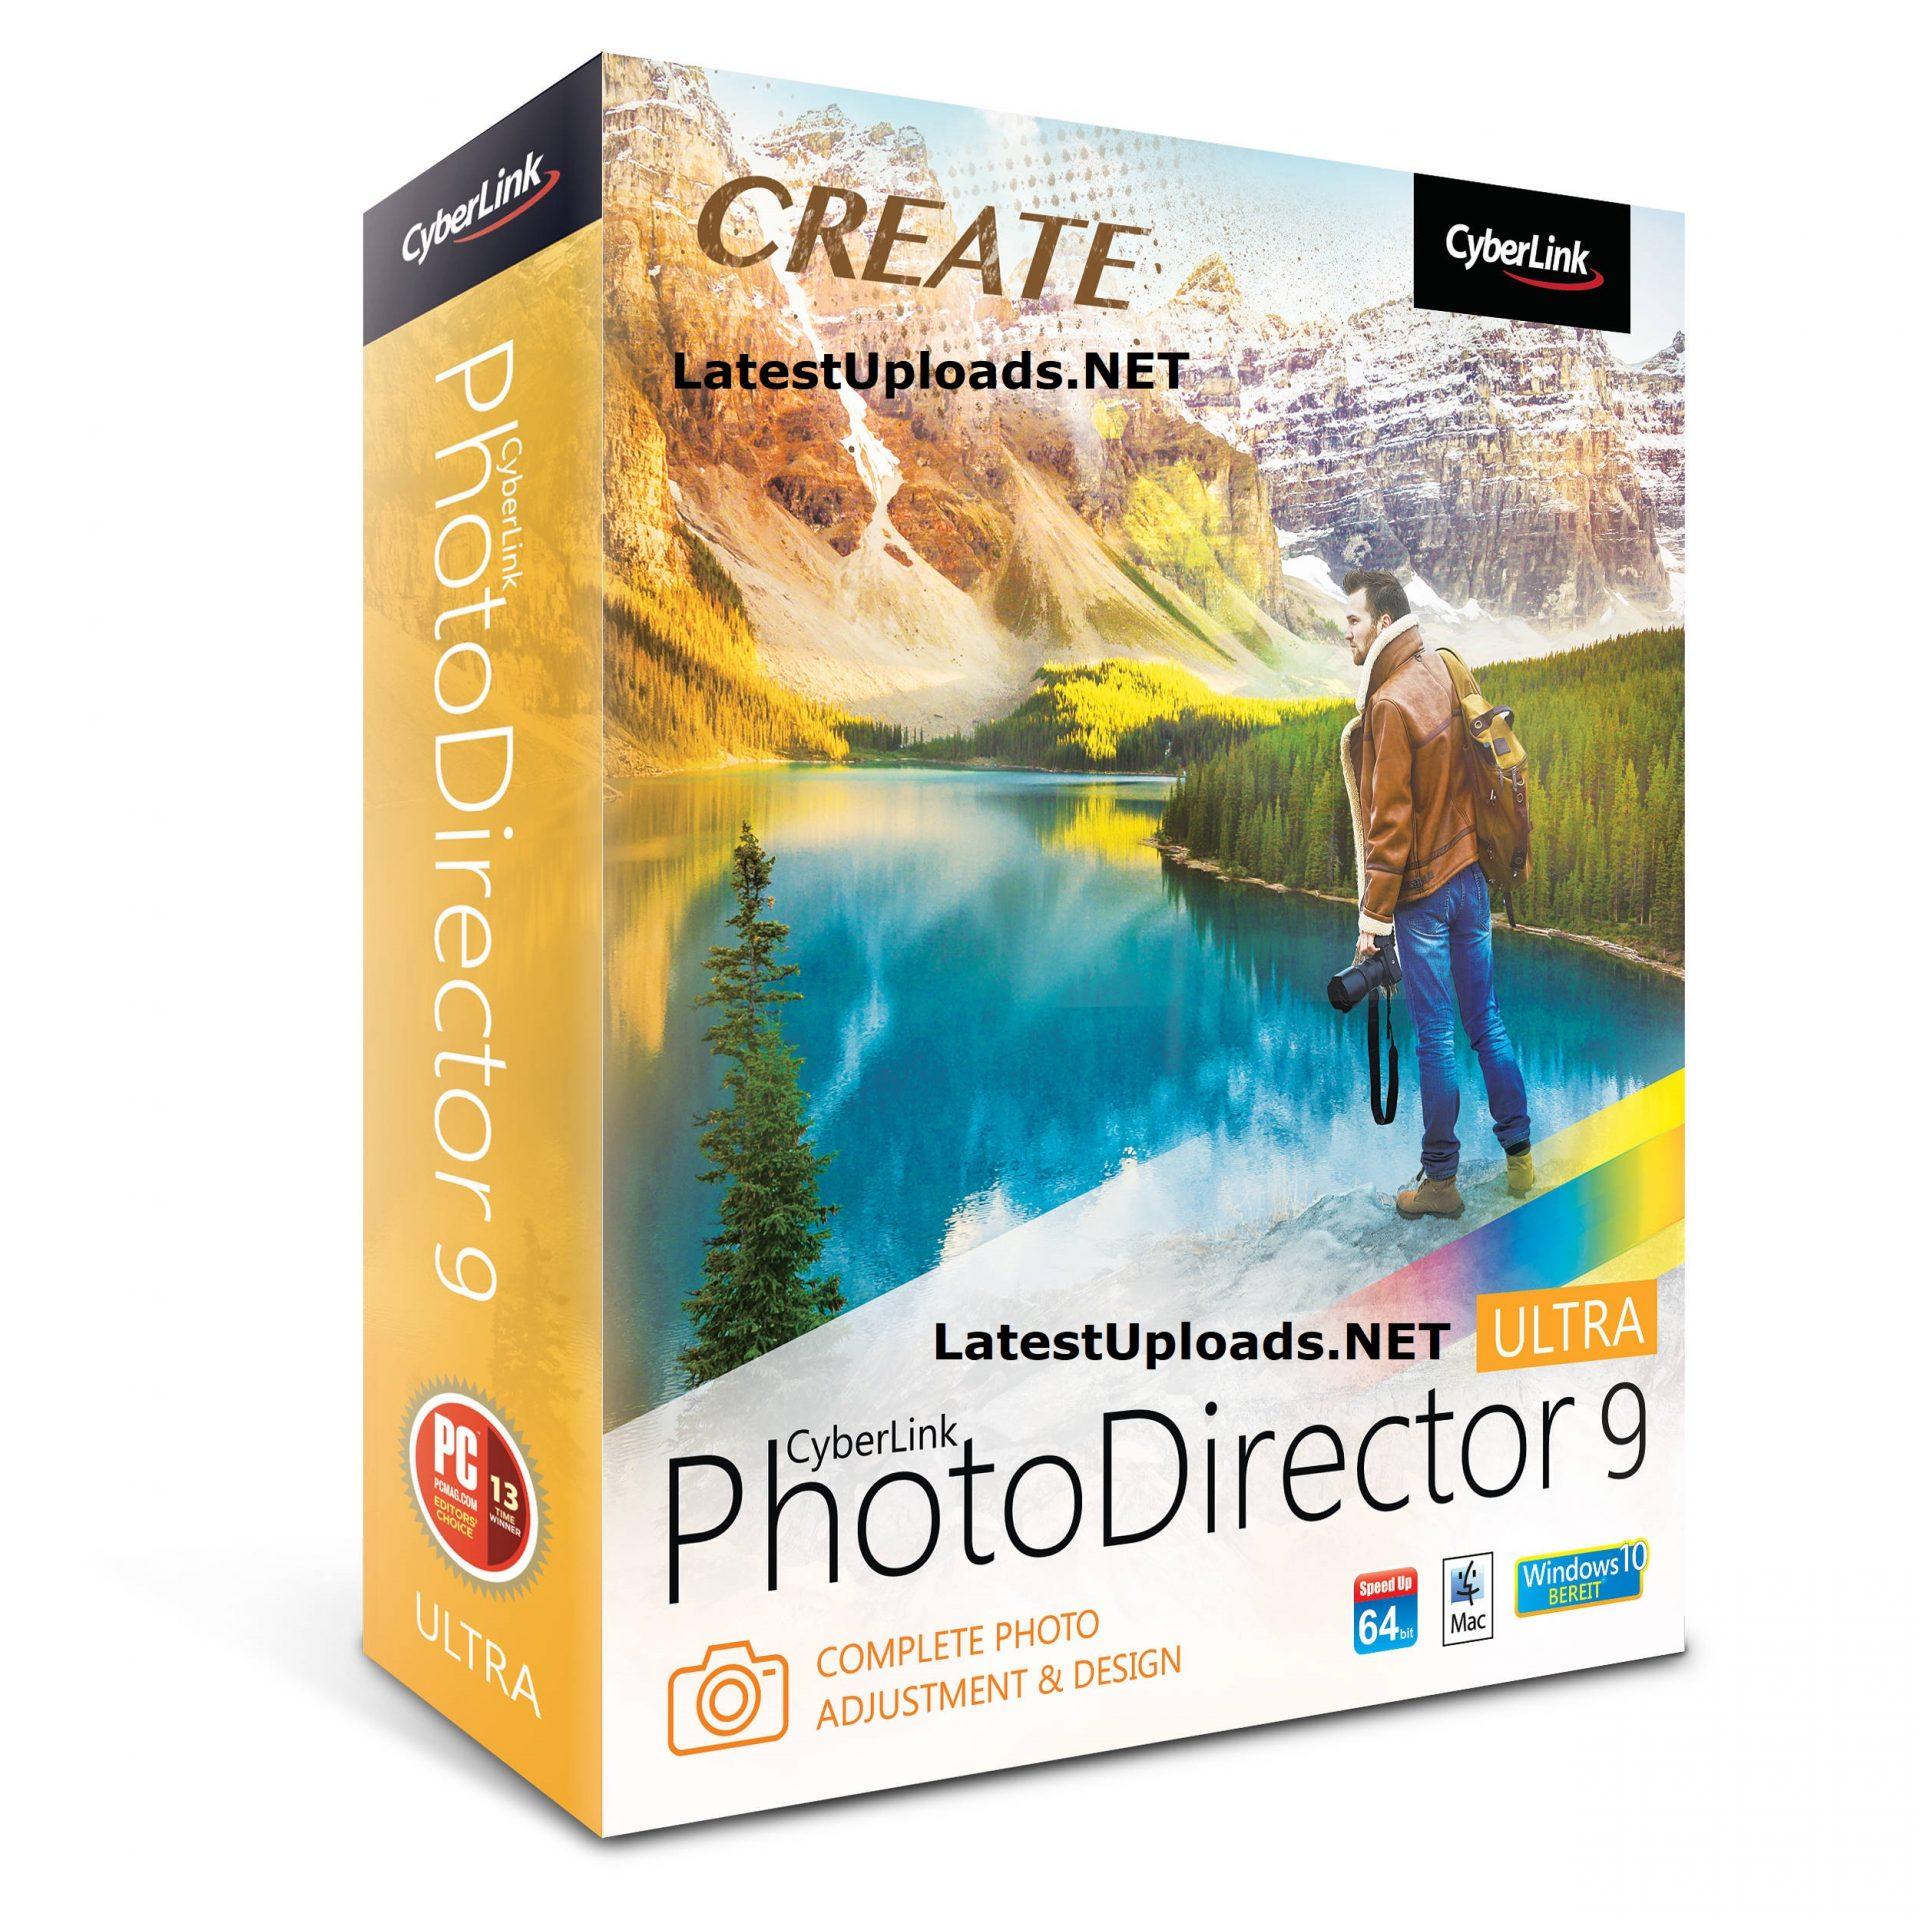 CyberLink PhotoDirector Ultra 9.0.2406.0 Free Download Full Version Crack Keygen